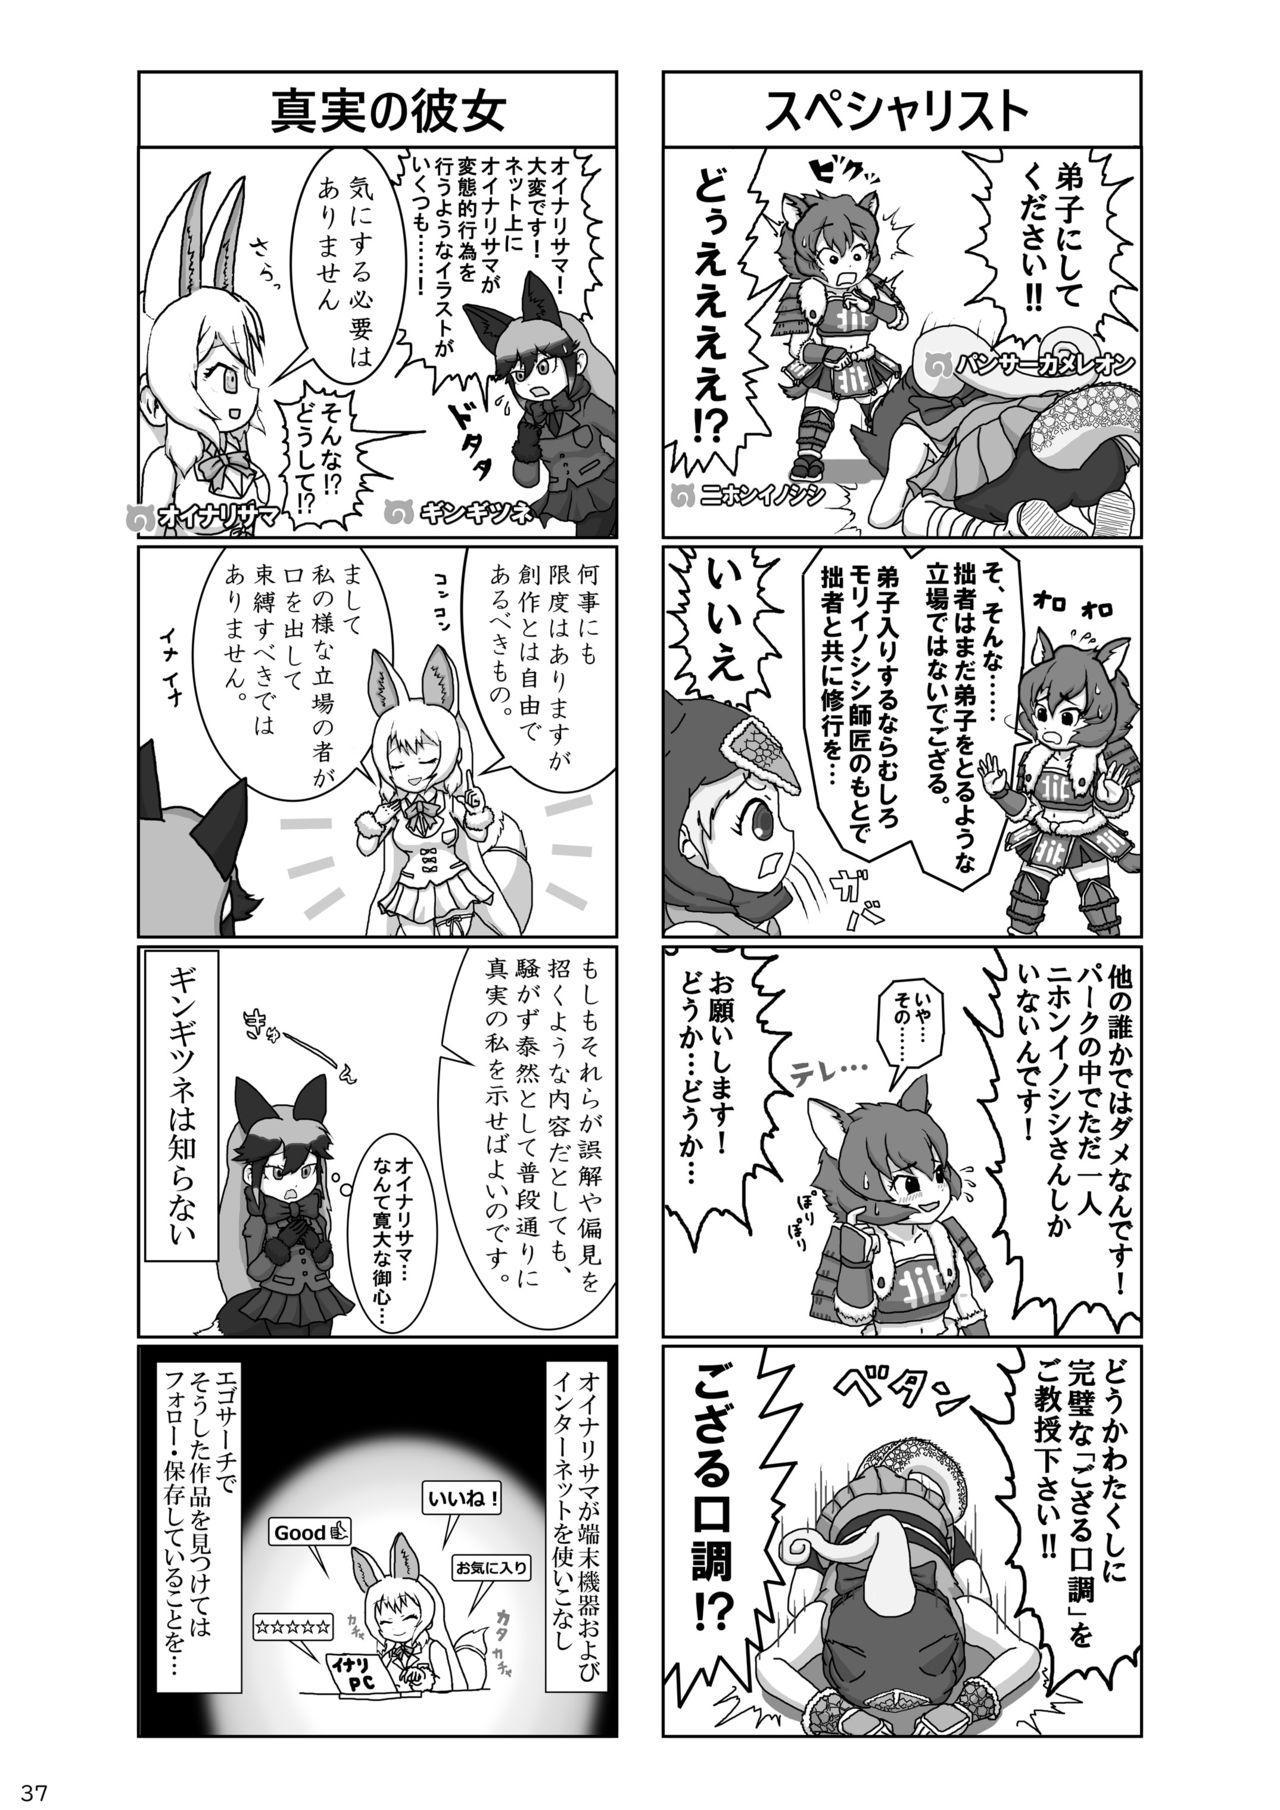 may Kemono Friends Thre Goudoushi 2 38